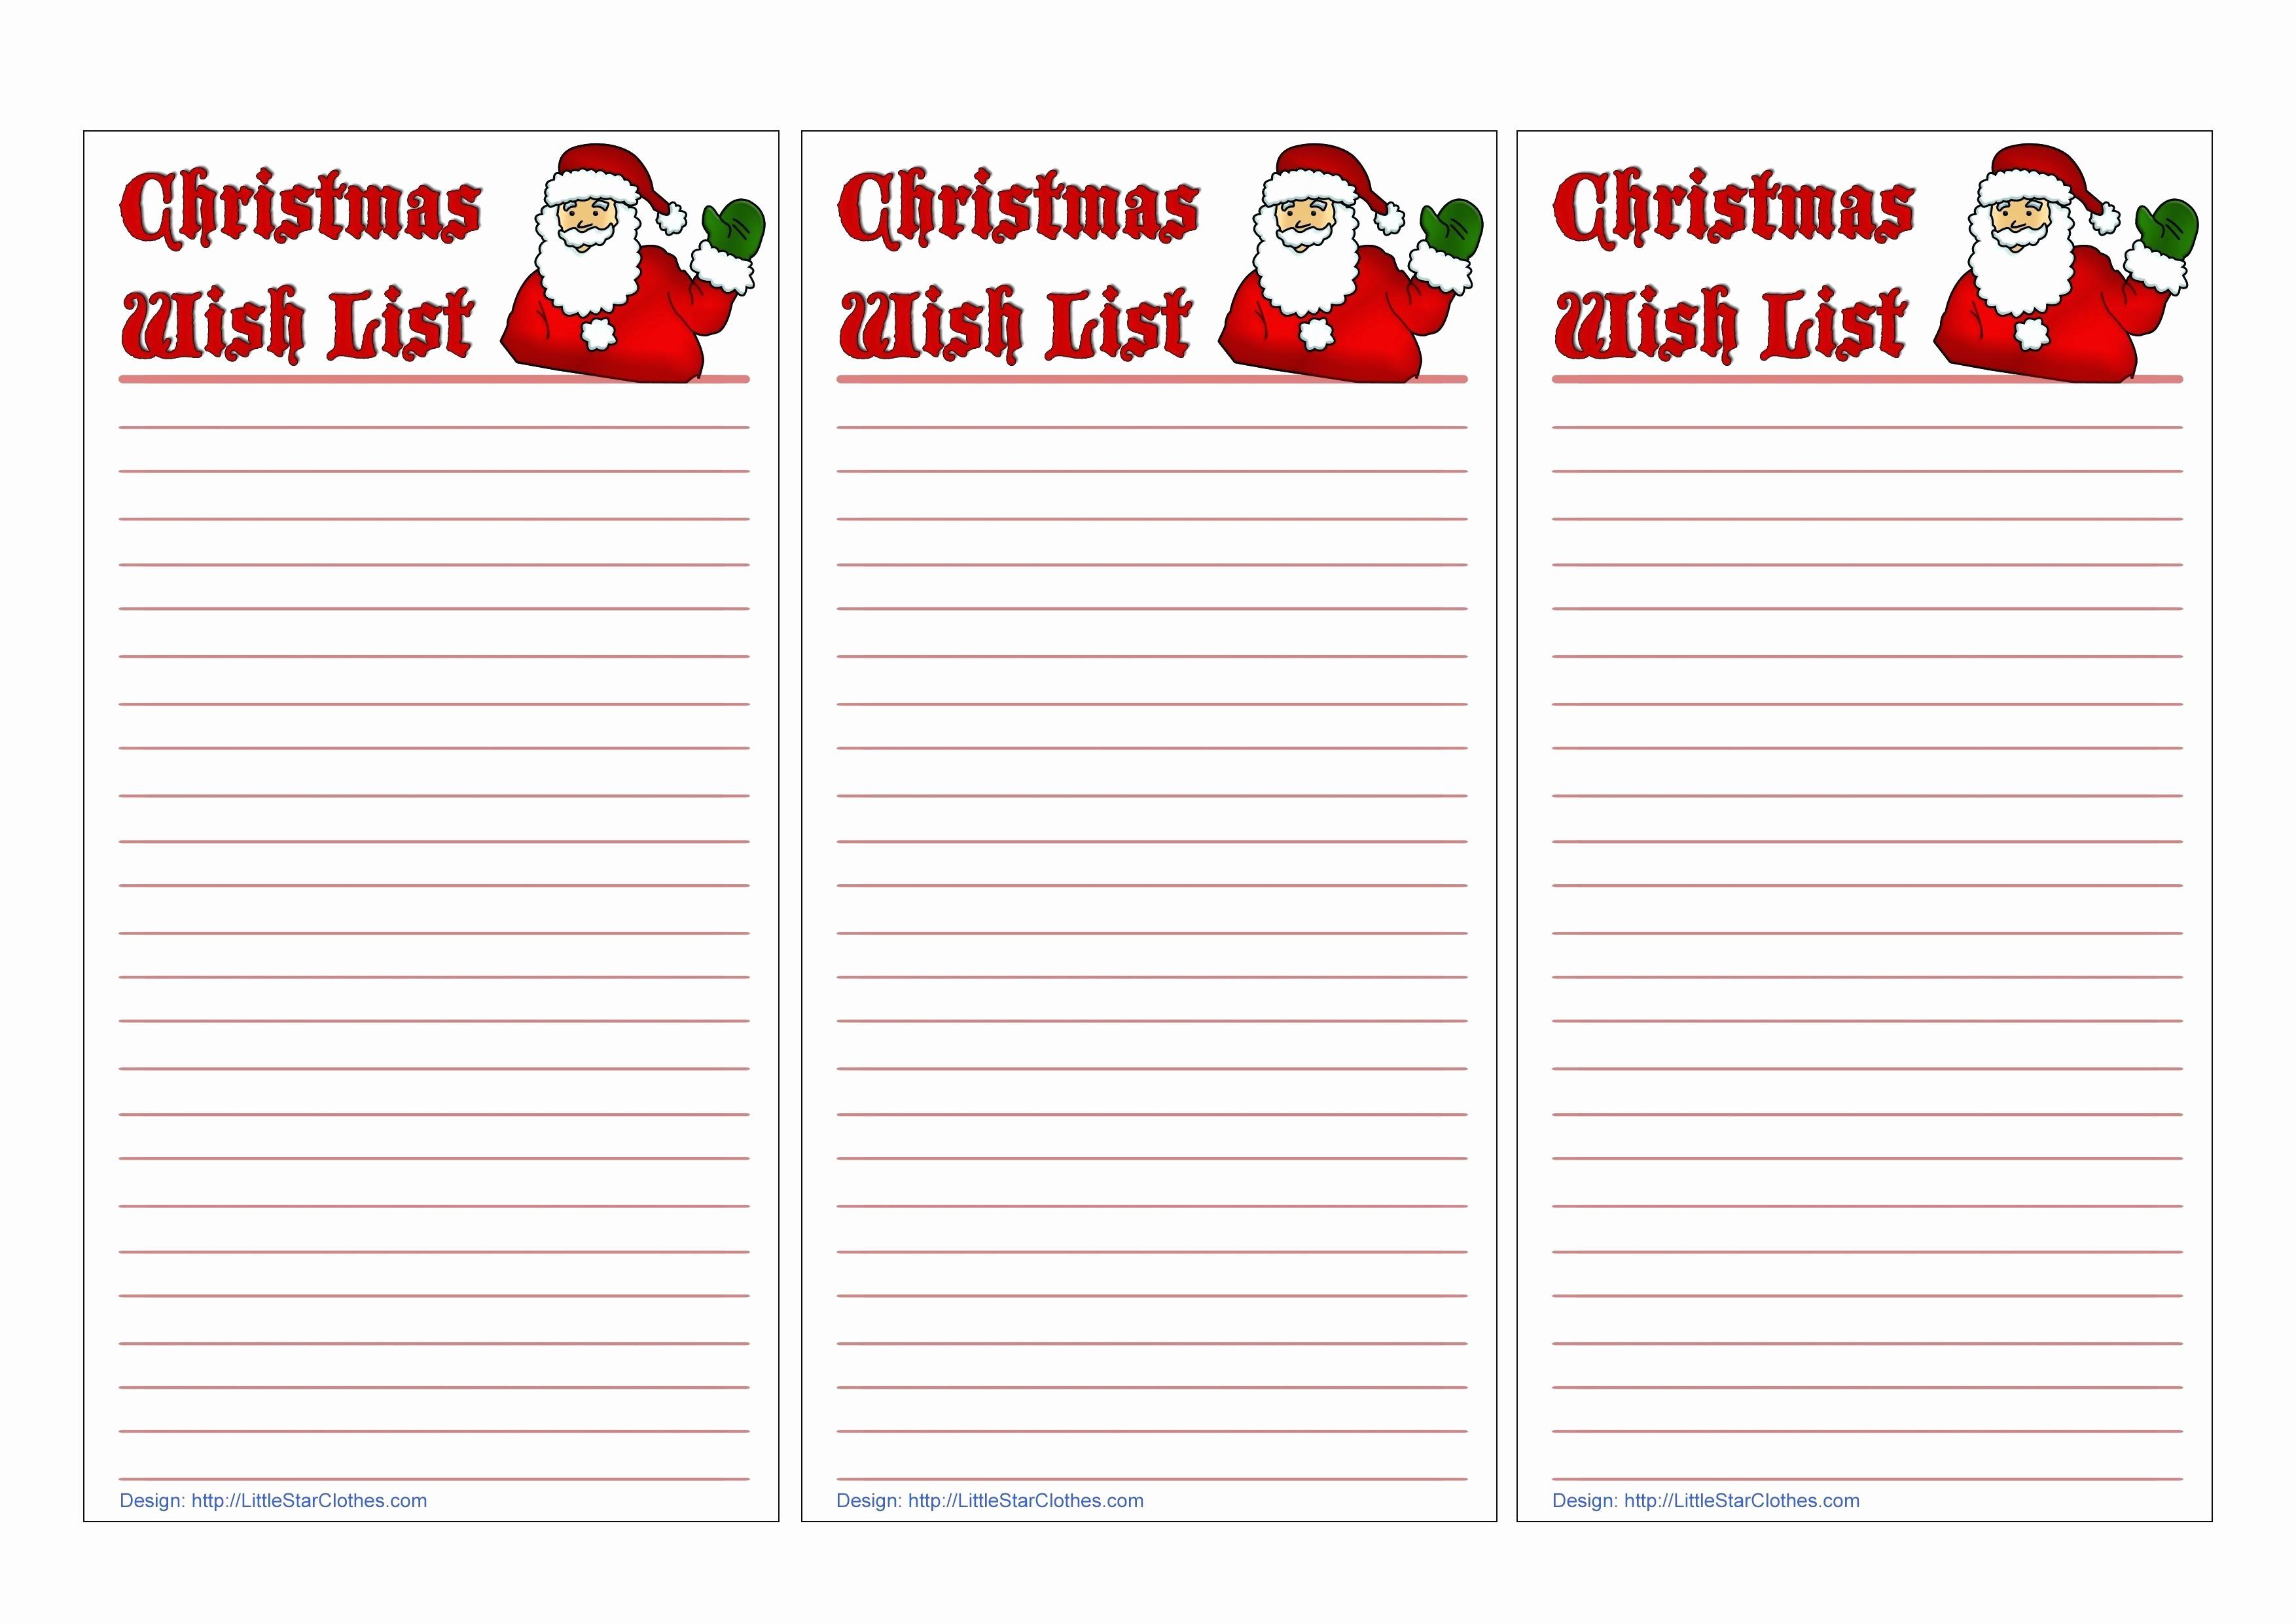 Birthday Wish List Template Printable Elegant Birthday T List Template thevillas